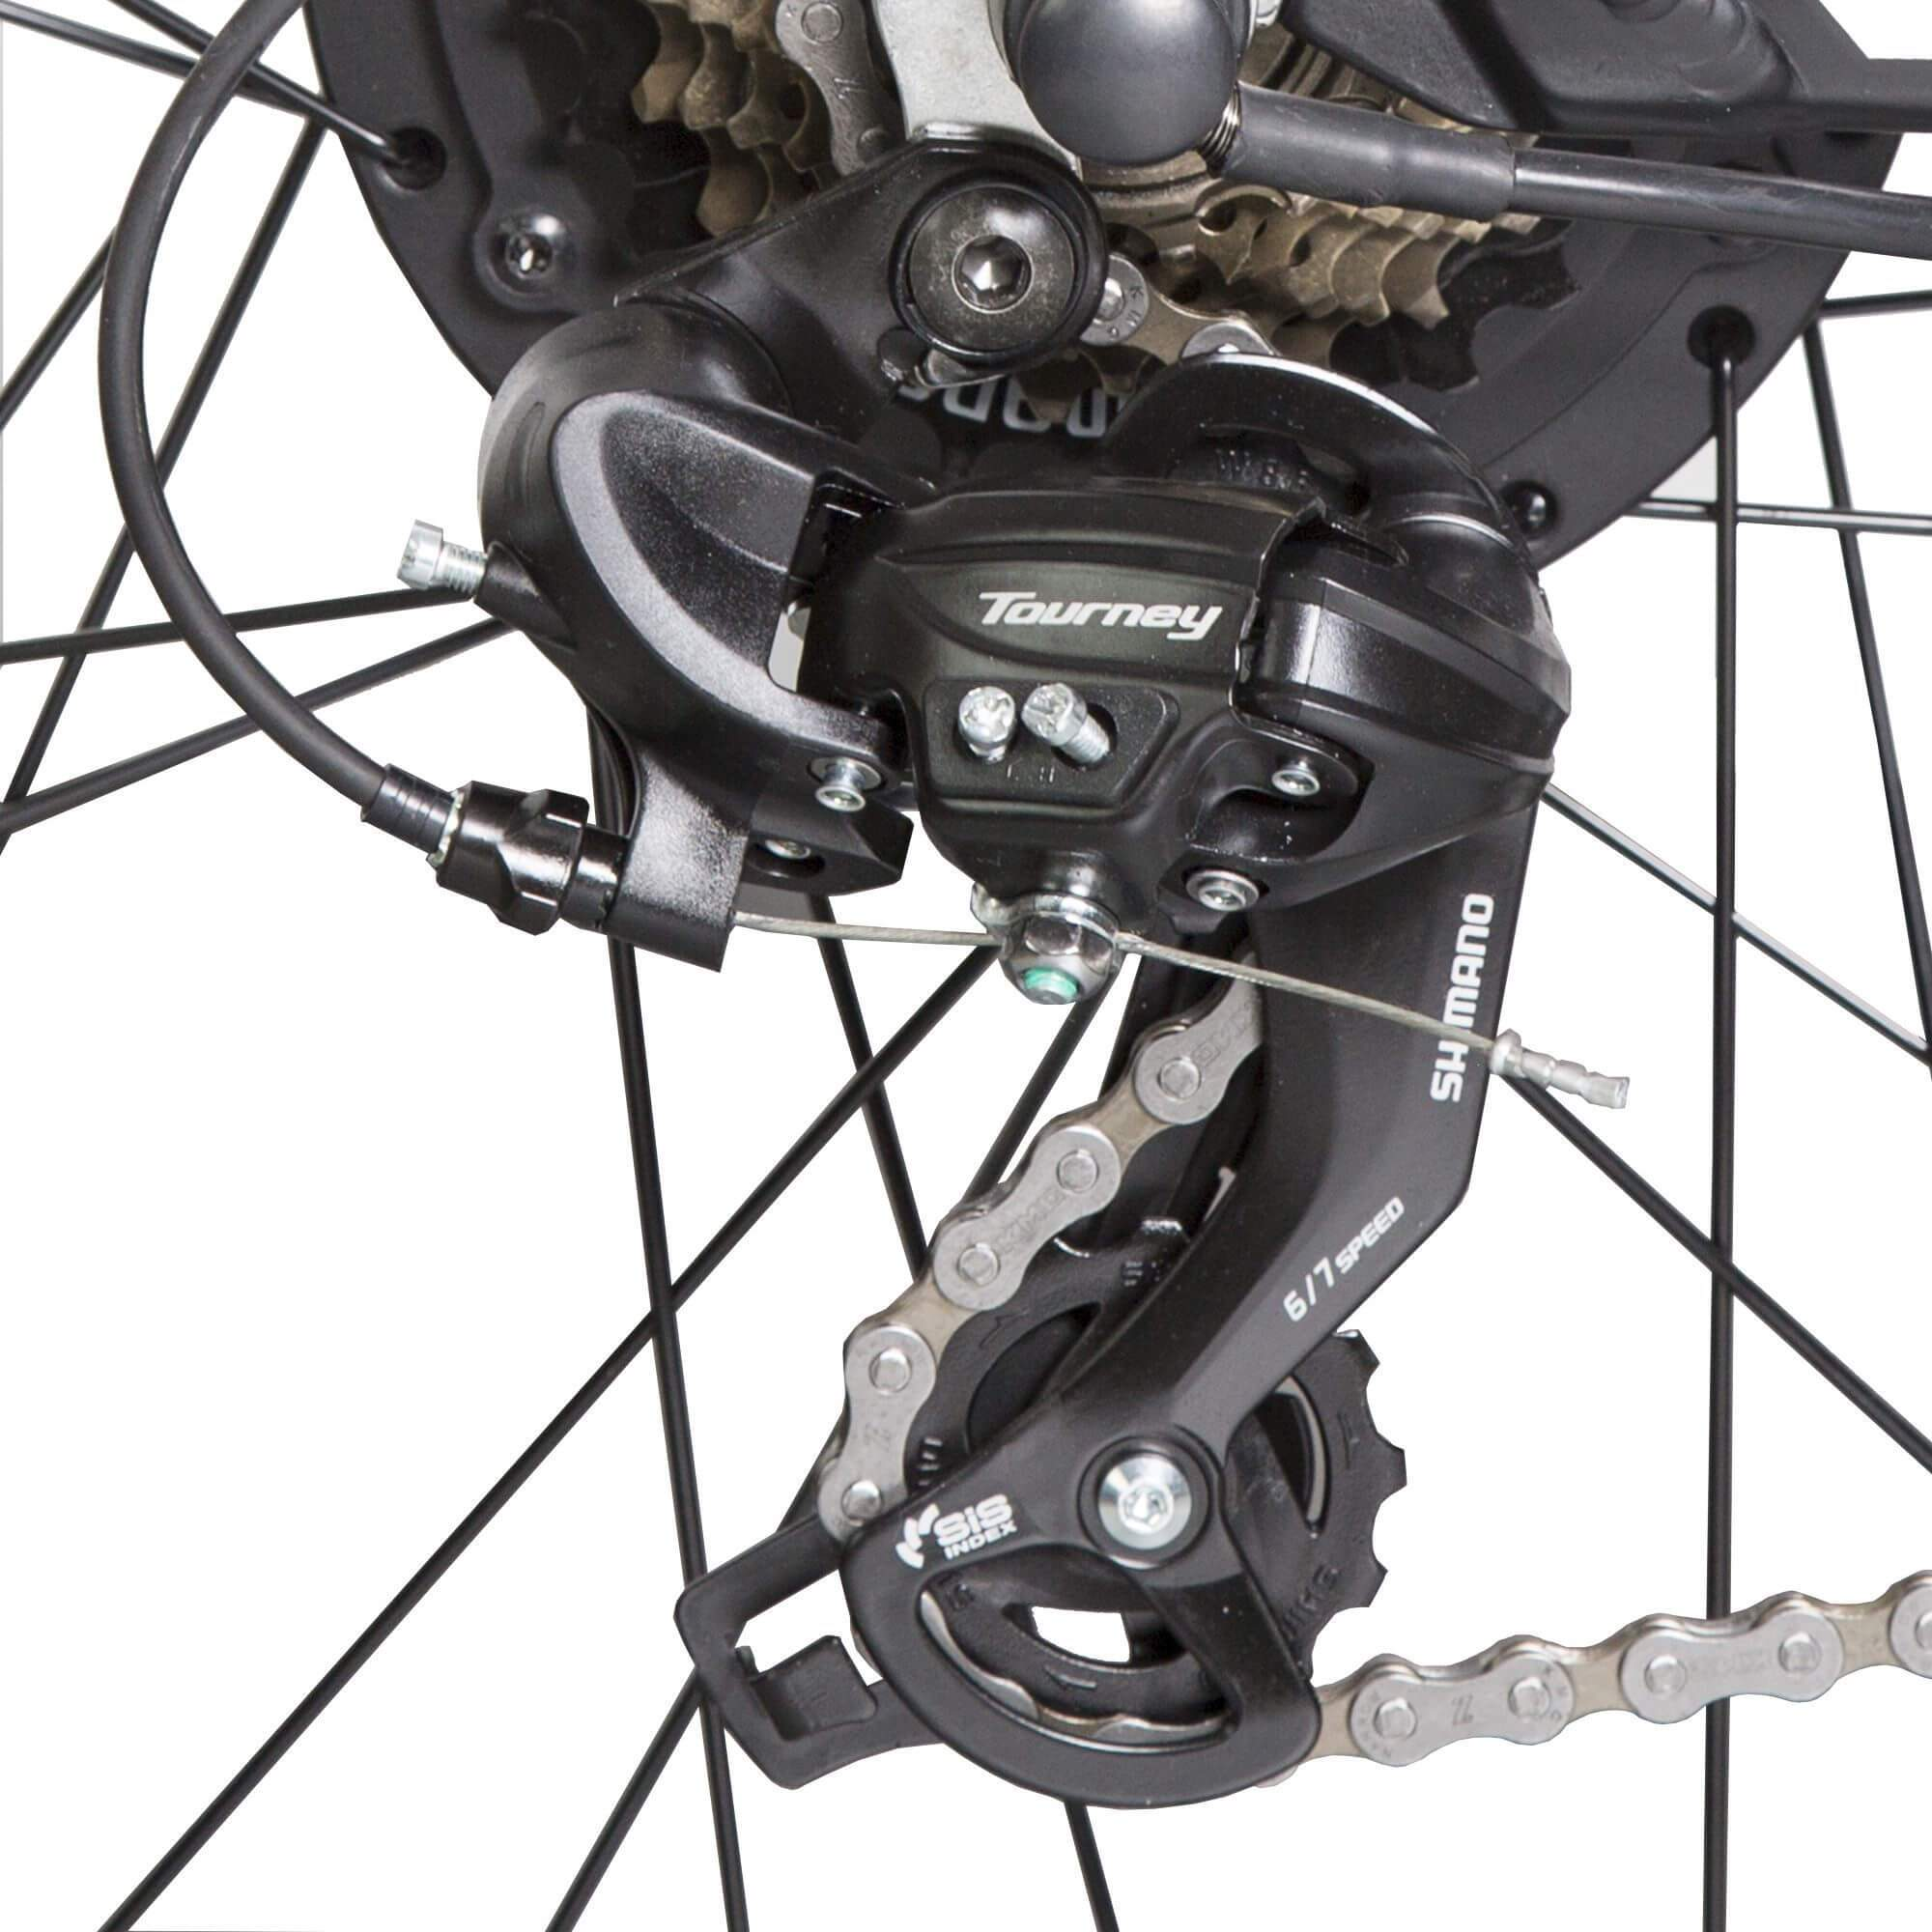 Ecotric Tornado Fat Tire Electric Mountain Bike Review